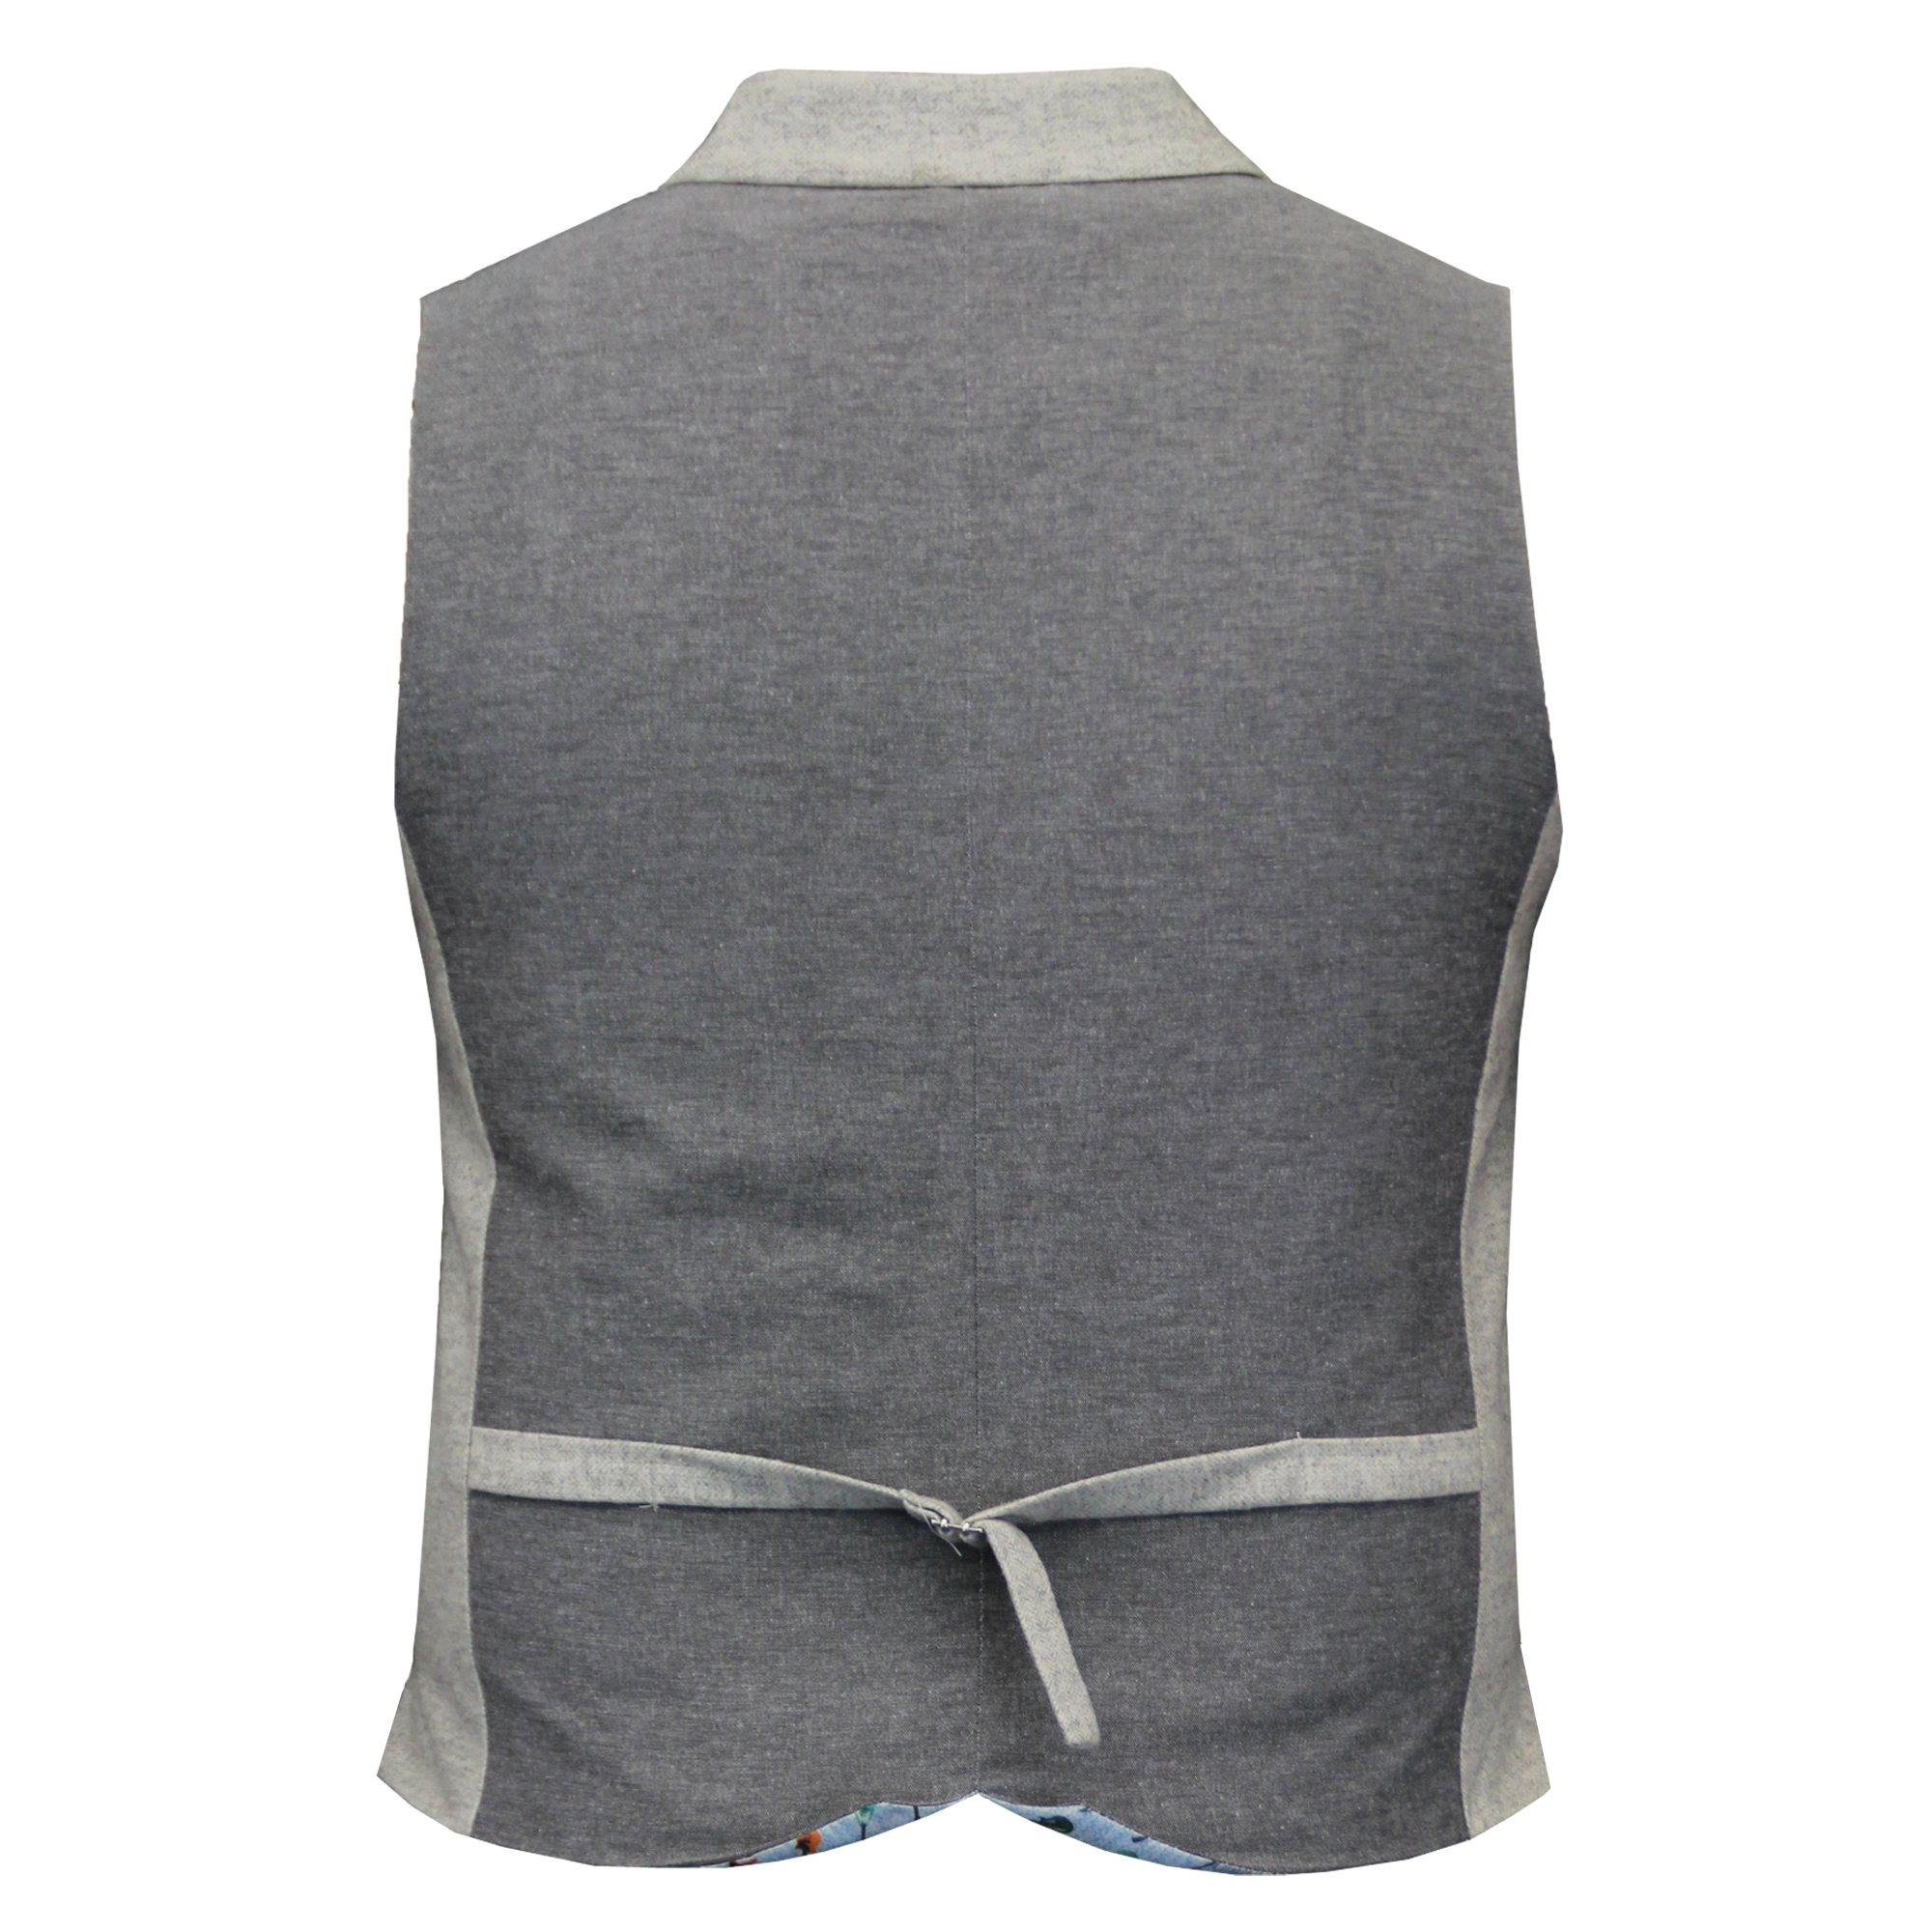 Mens-Waistcoat-Wool-Mix-Cavani-Formal-Vest-Herringbone-Tweed-Check-Party-Smart thumbnail 22